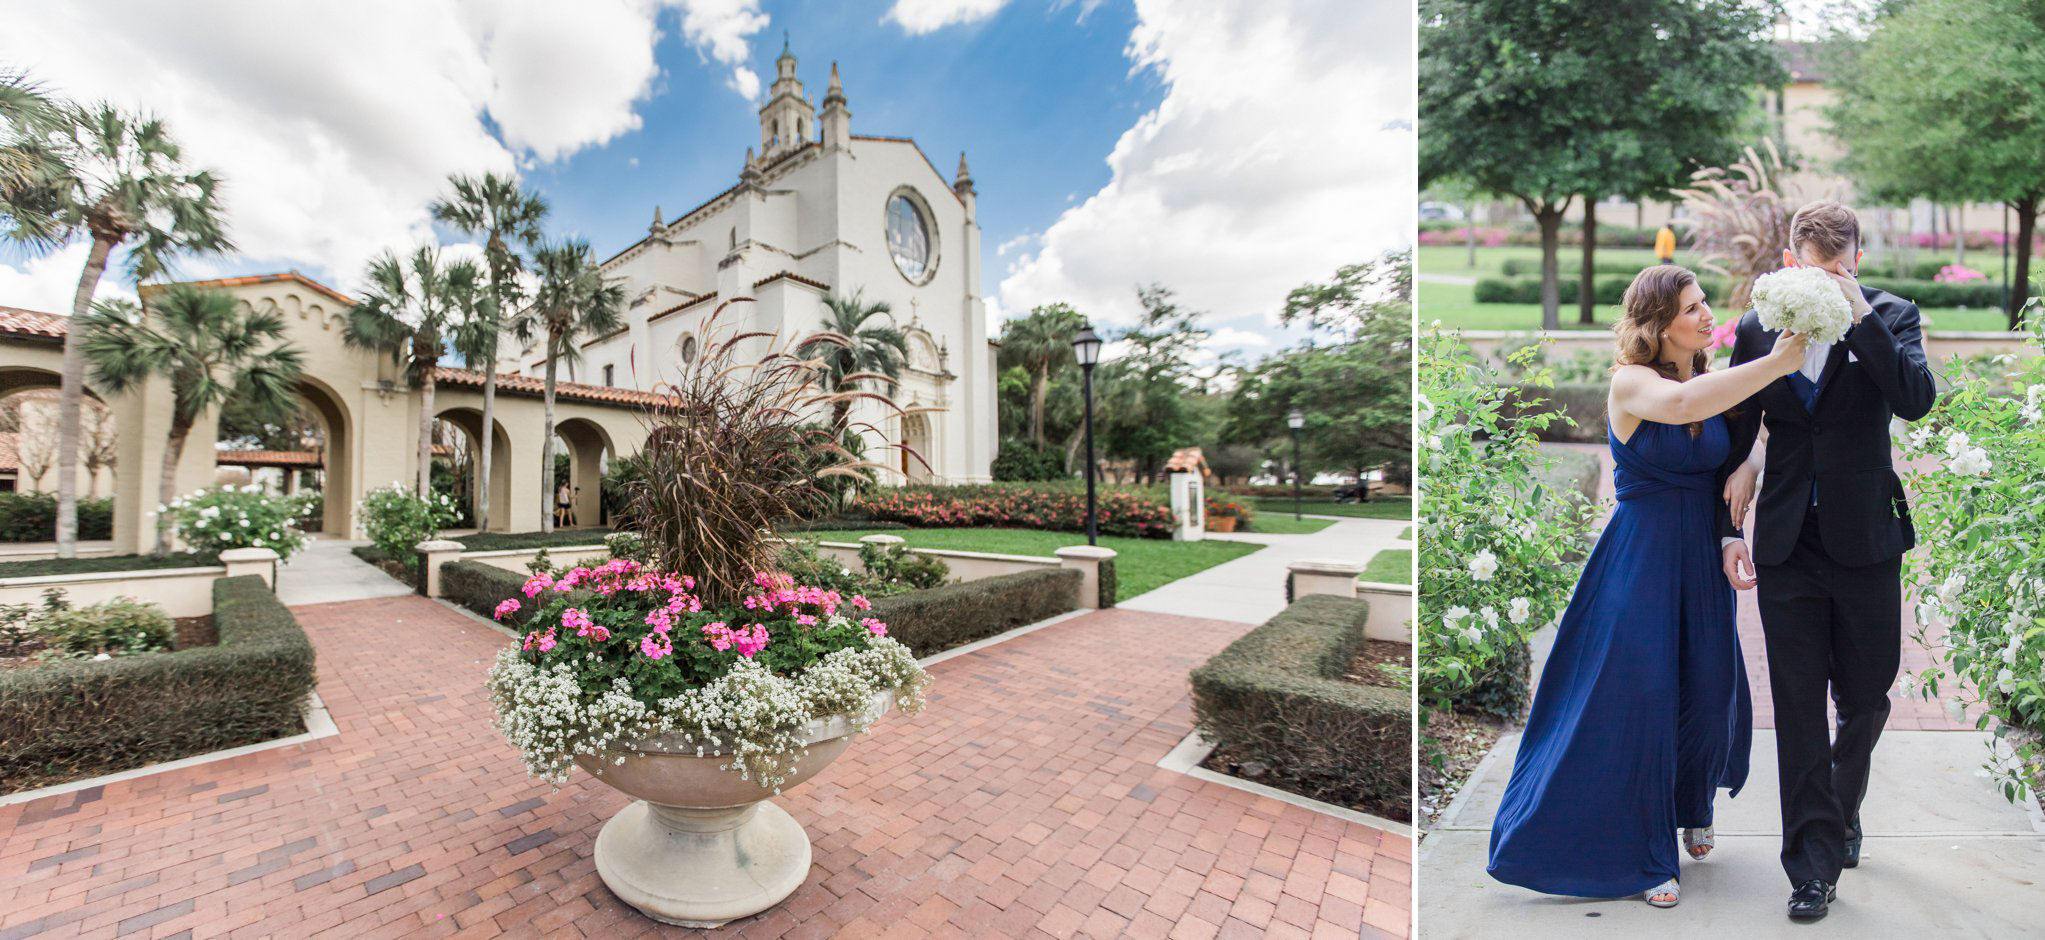 Rollins Chapel + Orlando Science Center Gay LGBT Dinosaur Themed Wedding Adam + Craig 13.jpg